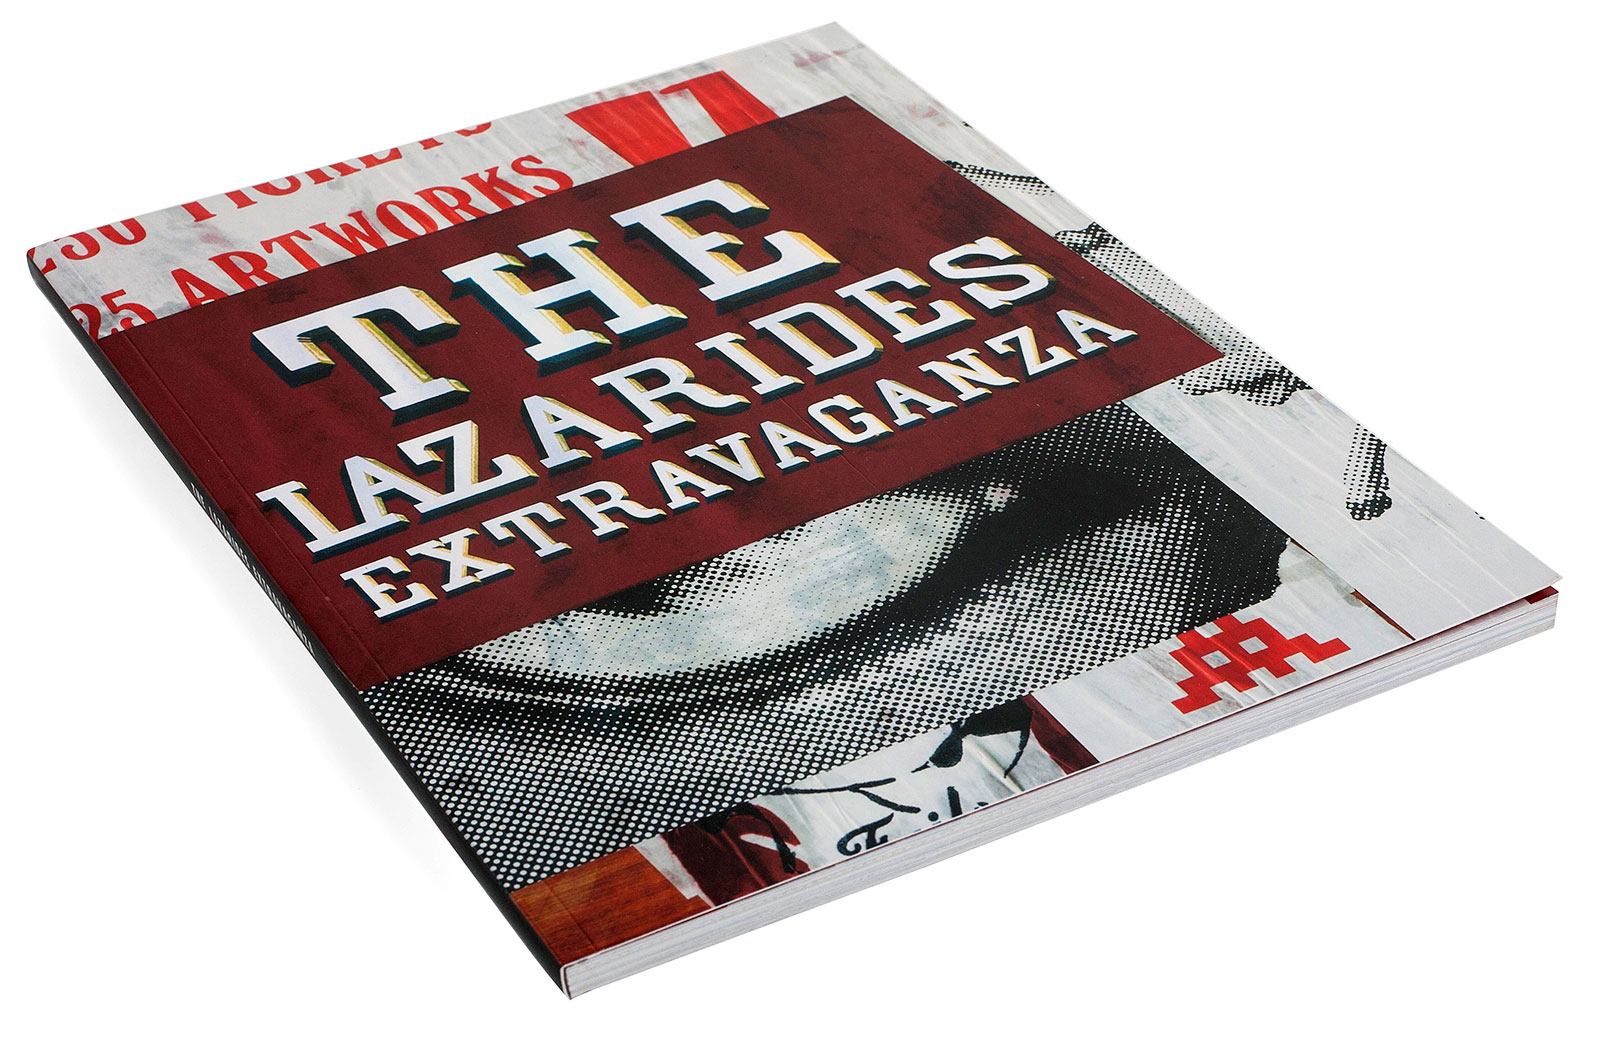 Extravaganza - Lazarides Show Book